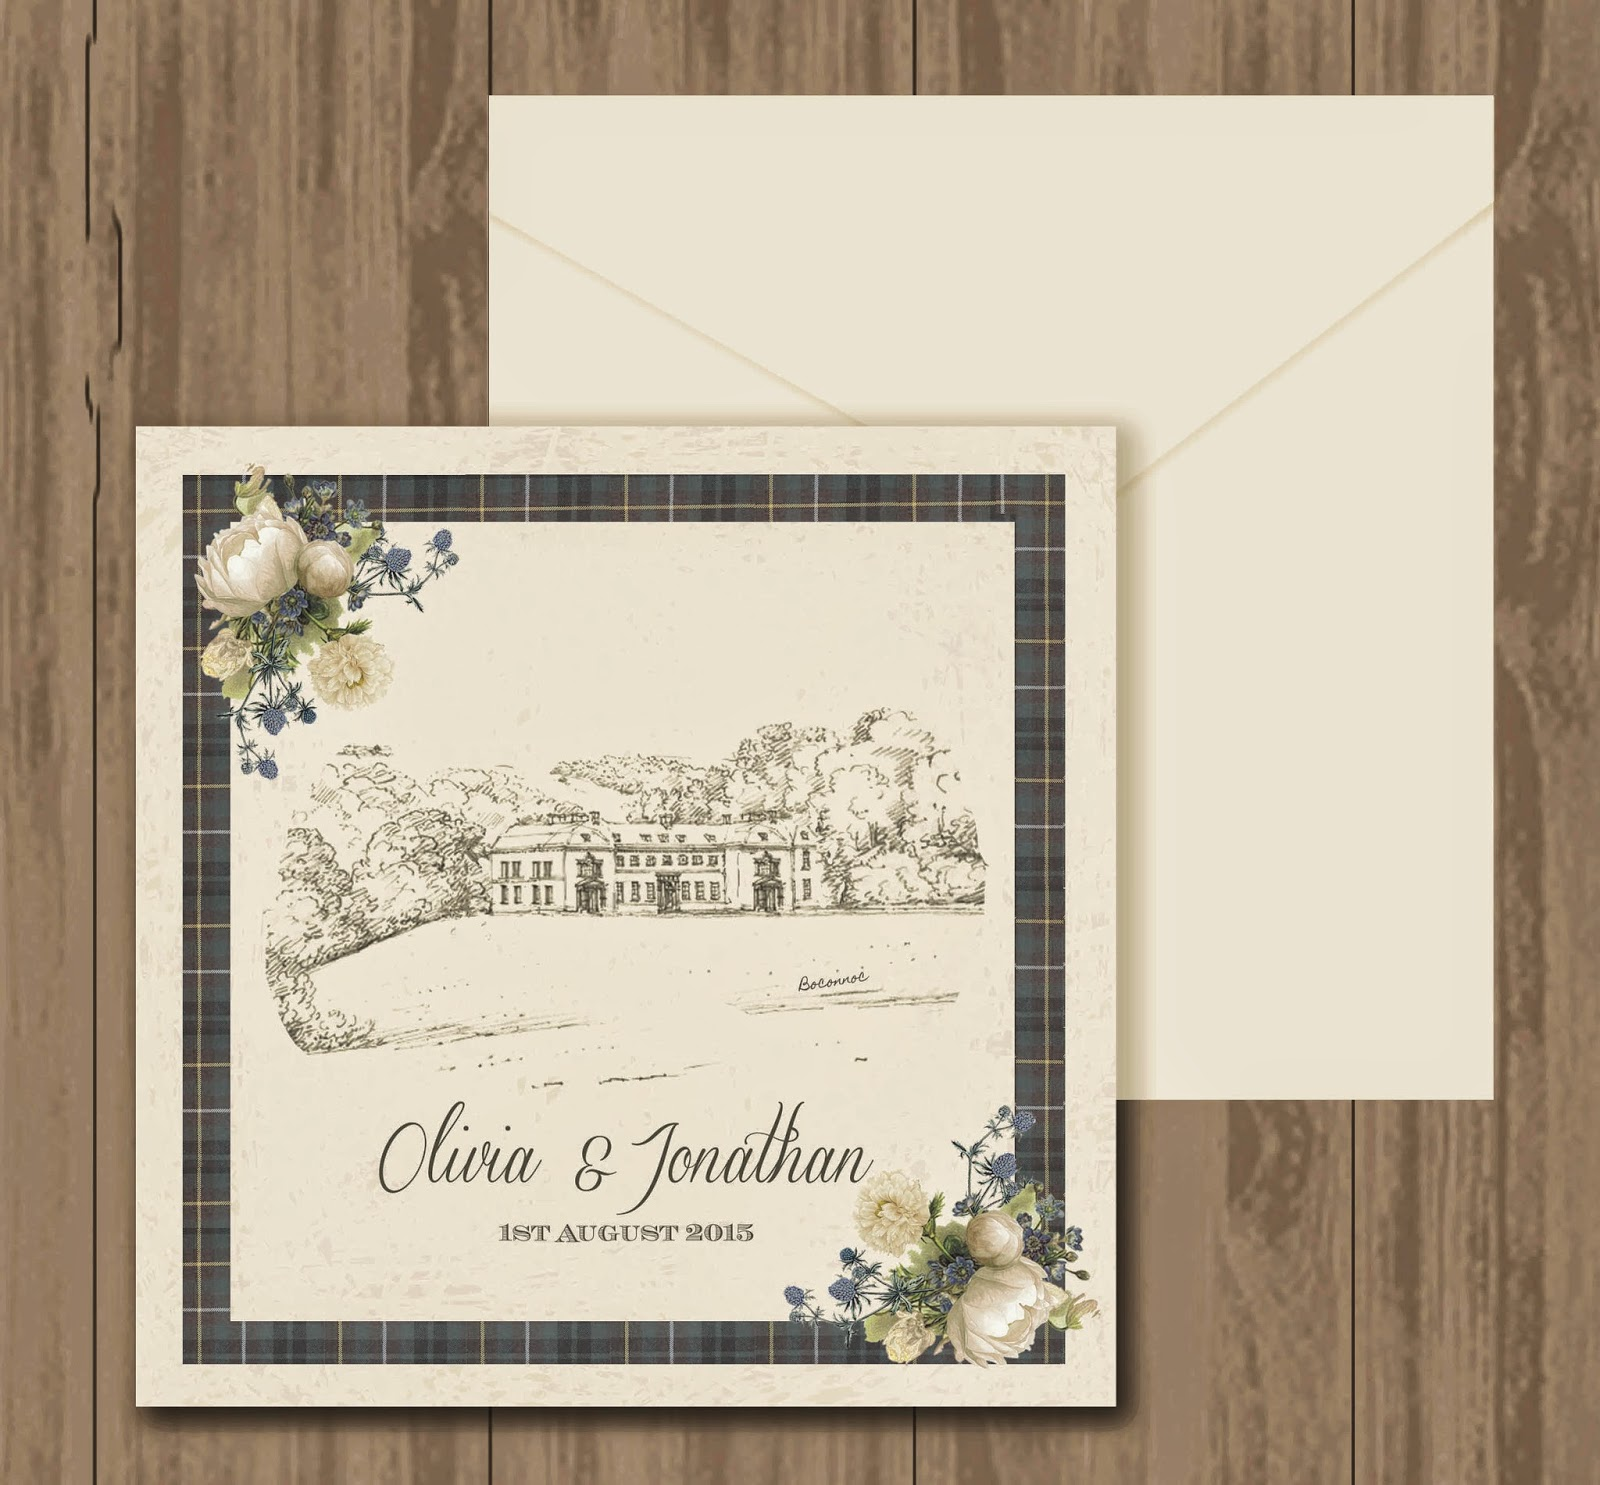 Knots And Kisses Wedding Stationery: Bespoke Cornish Sketch Wedding ...